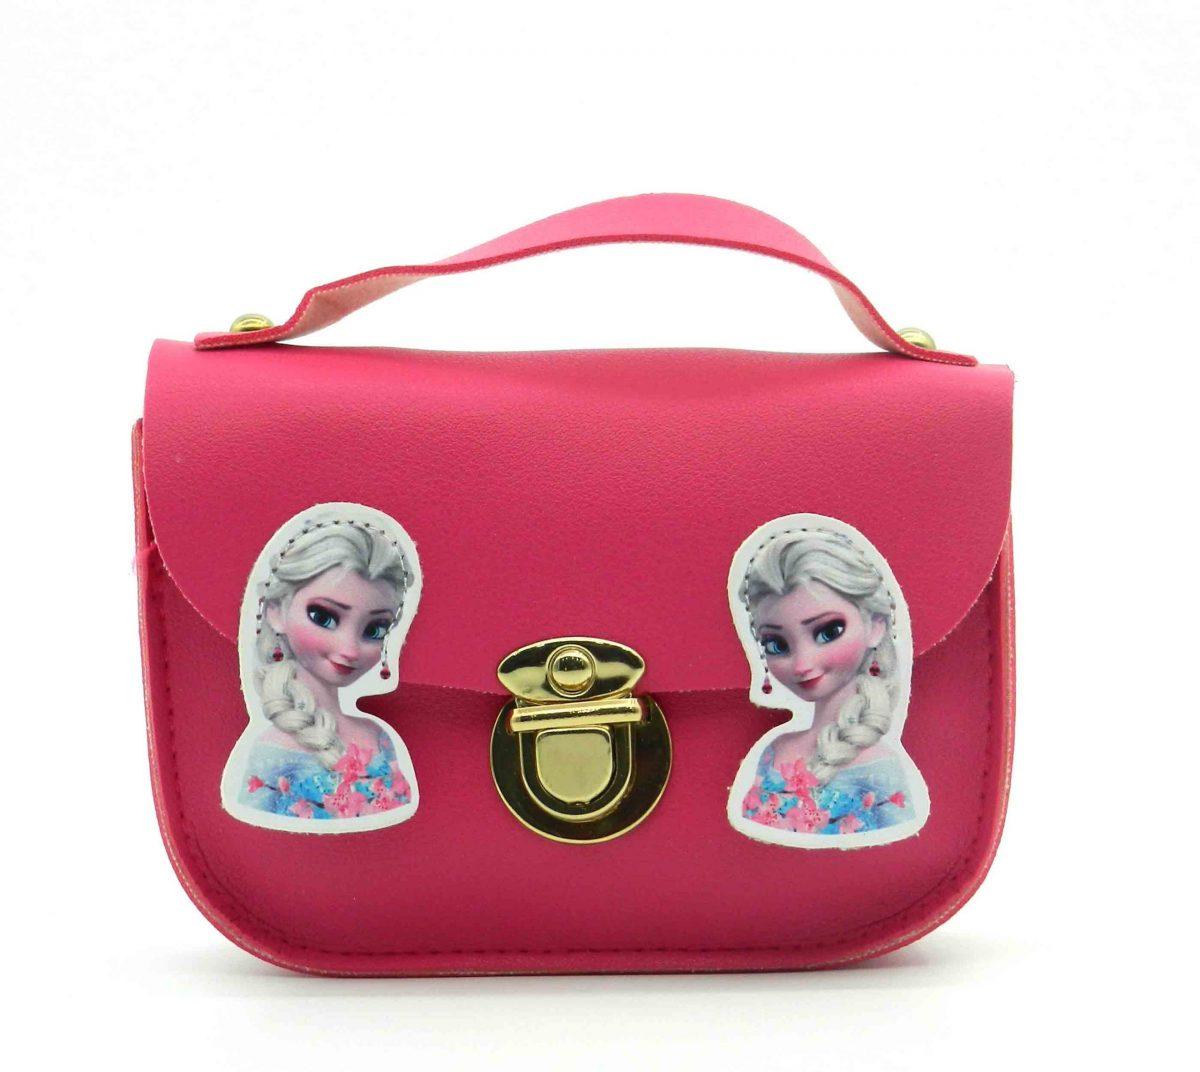 Princess Girl Children's Shoulder Baby BagPrincess Girl Children's Shoulder Baby Bag